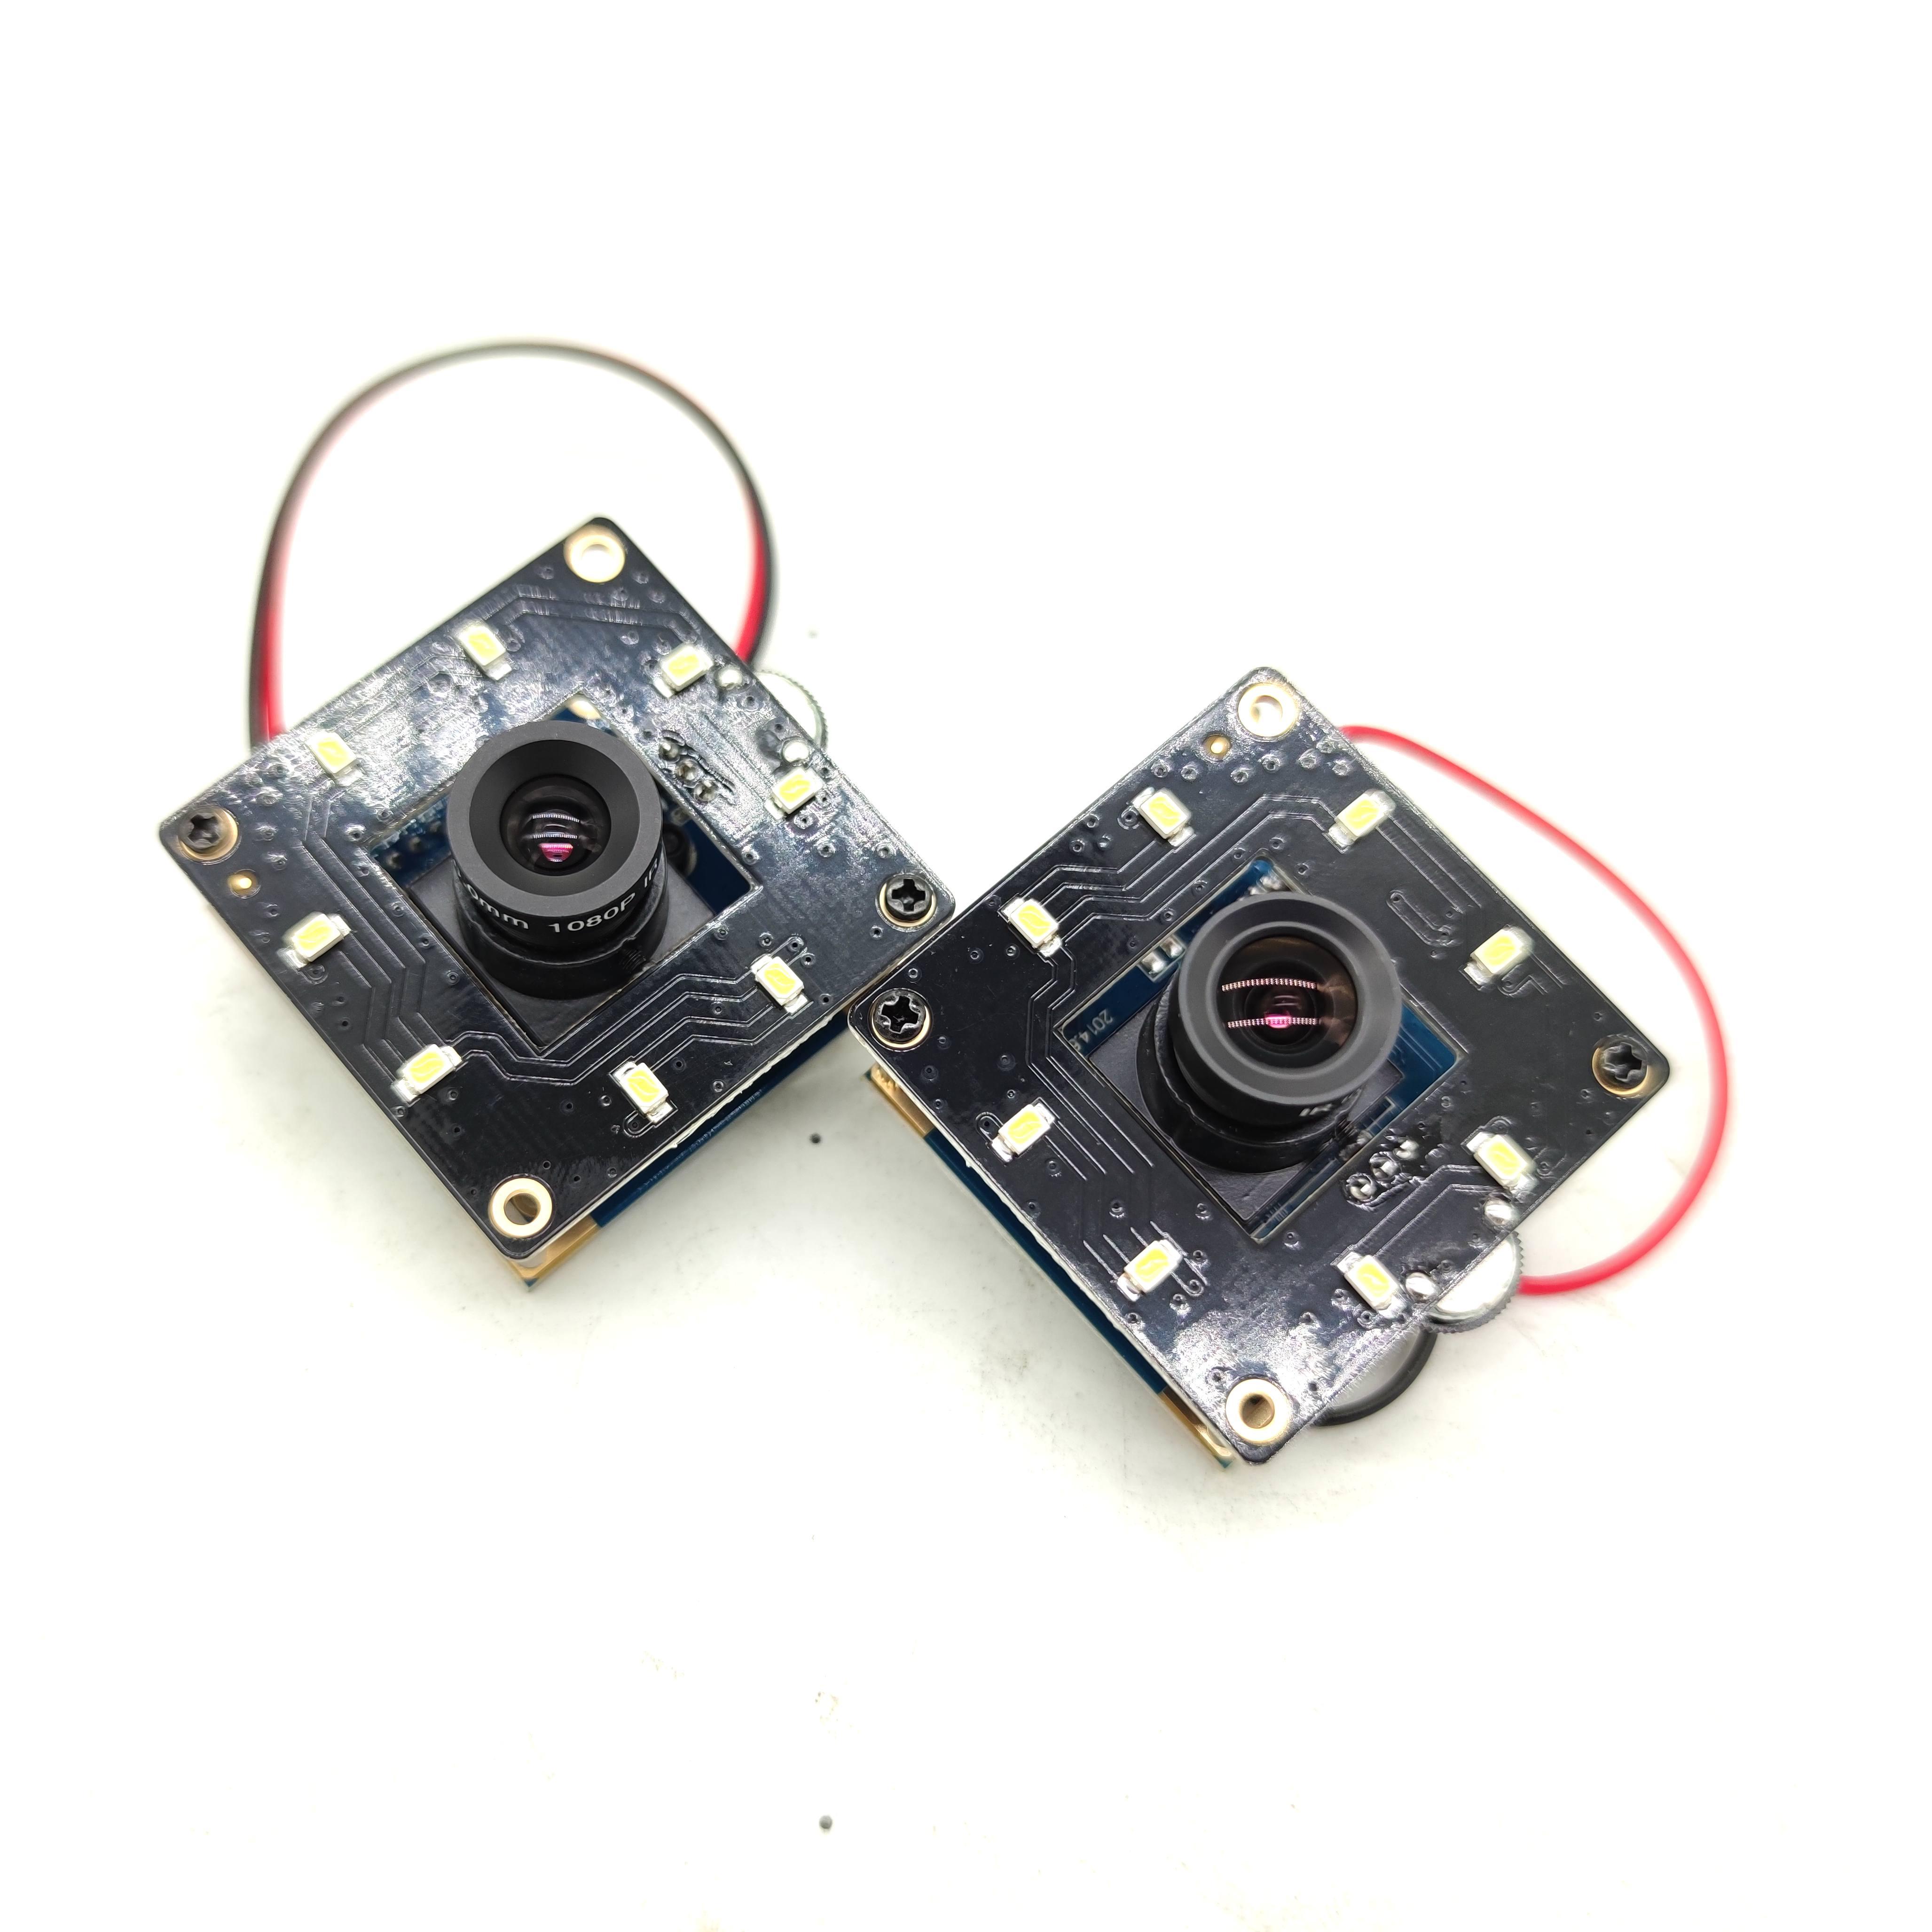 LED OpenPnP USB واجهة 1.0MP 720P الرؤية كاميرا وحدة 3.6/6 مللي متر البعد البؤري USB100W